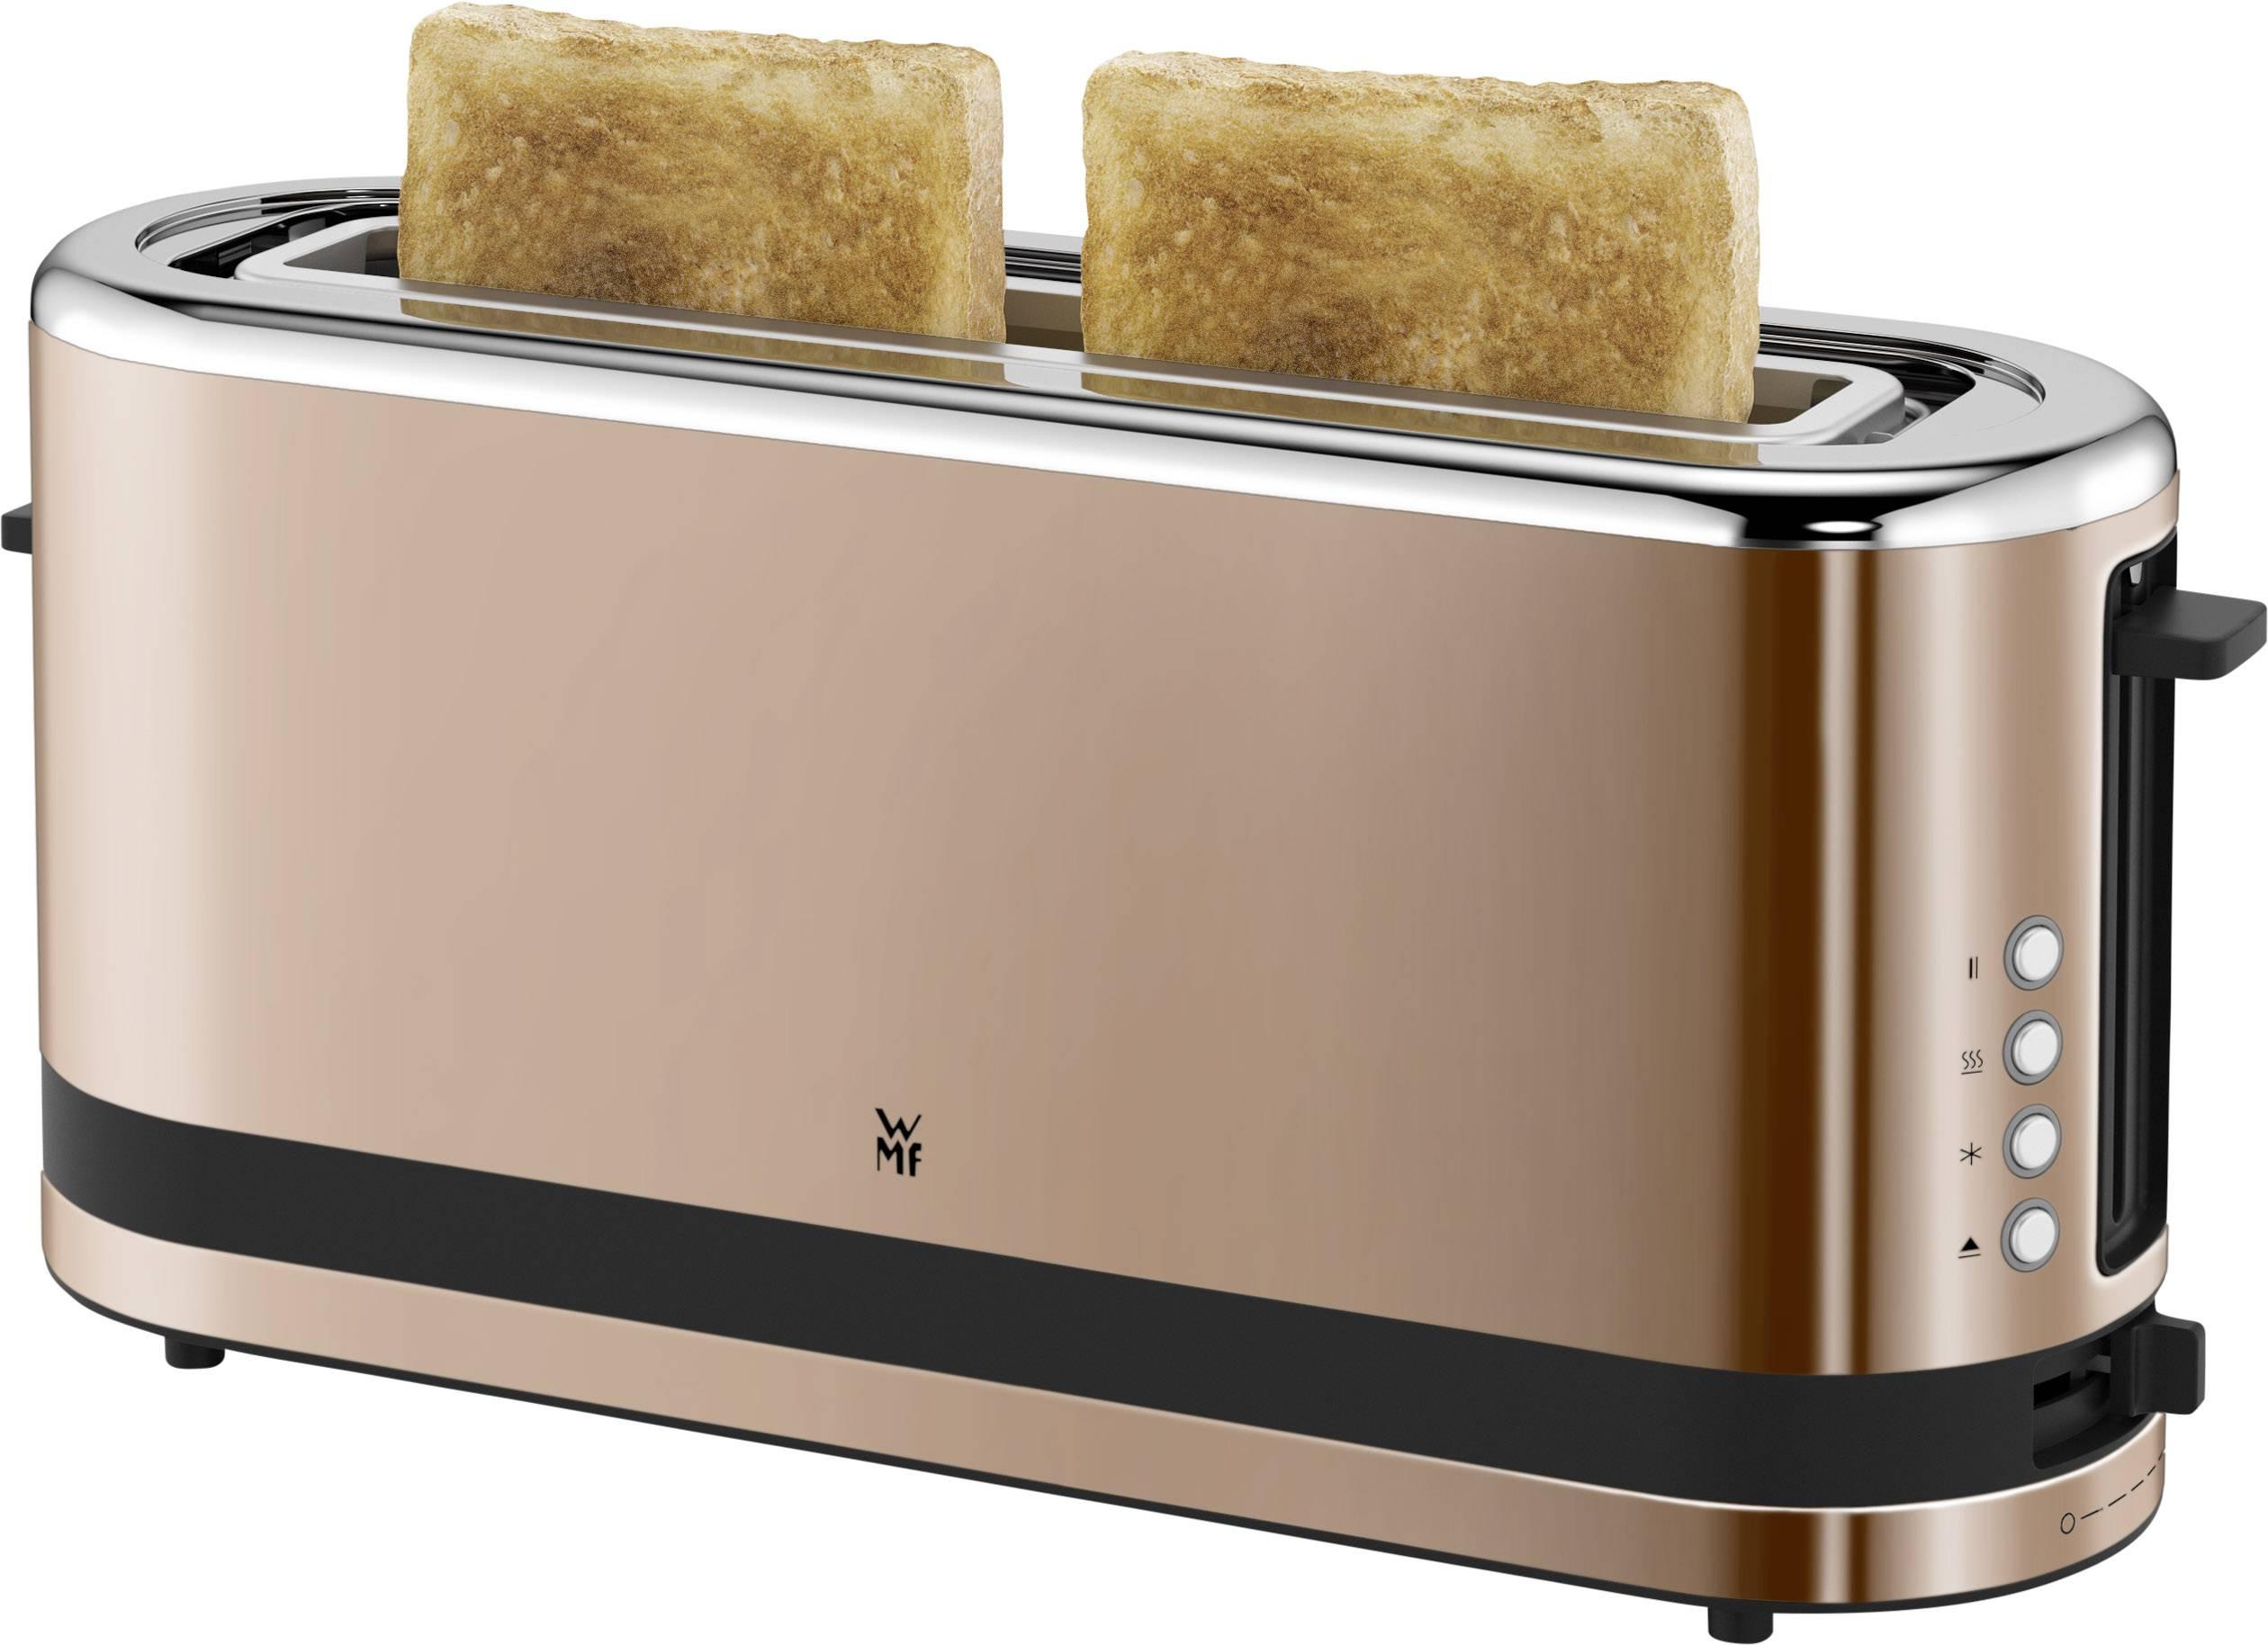 Wmf Elektrogrill Lono Family Test : Ersatzteile wmf kaffeemaschine lono wmf kaffeeautomat